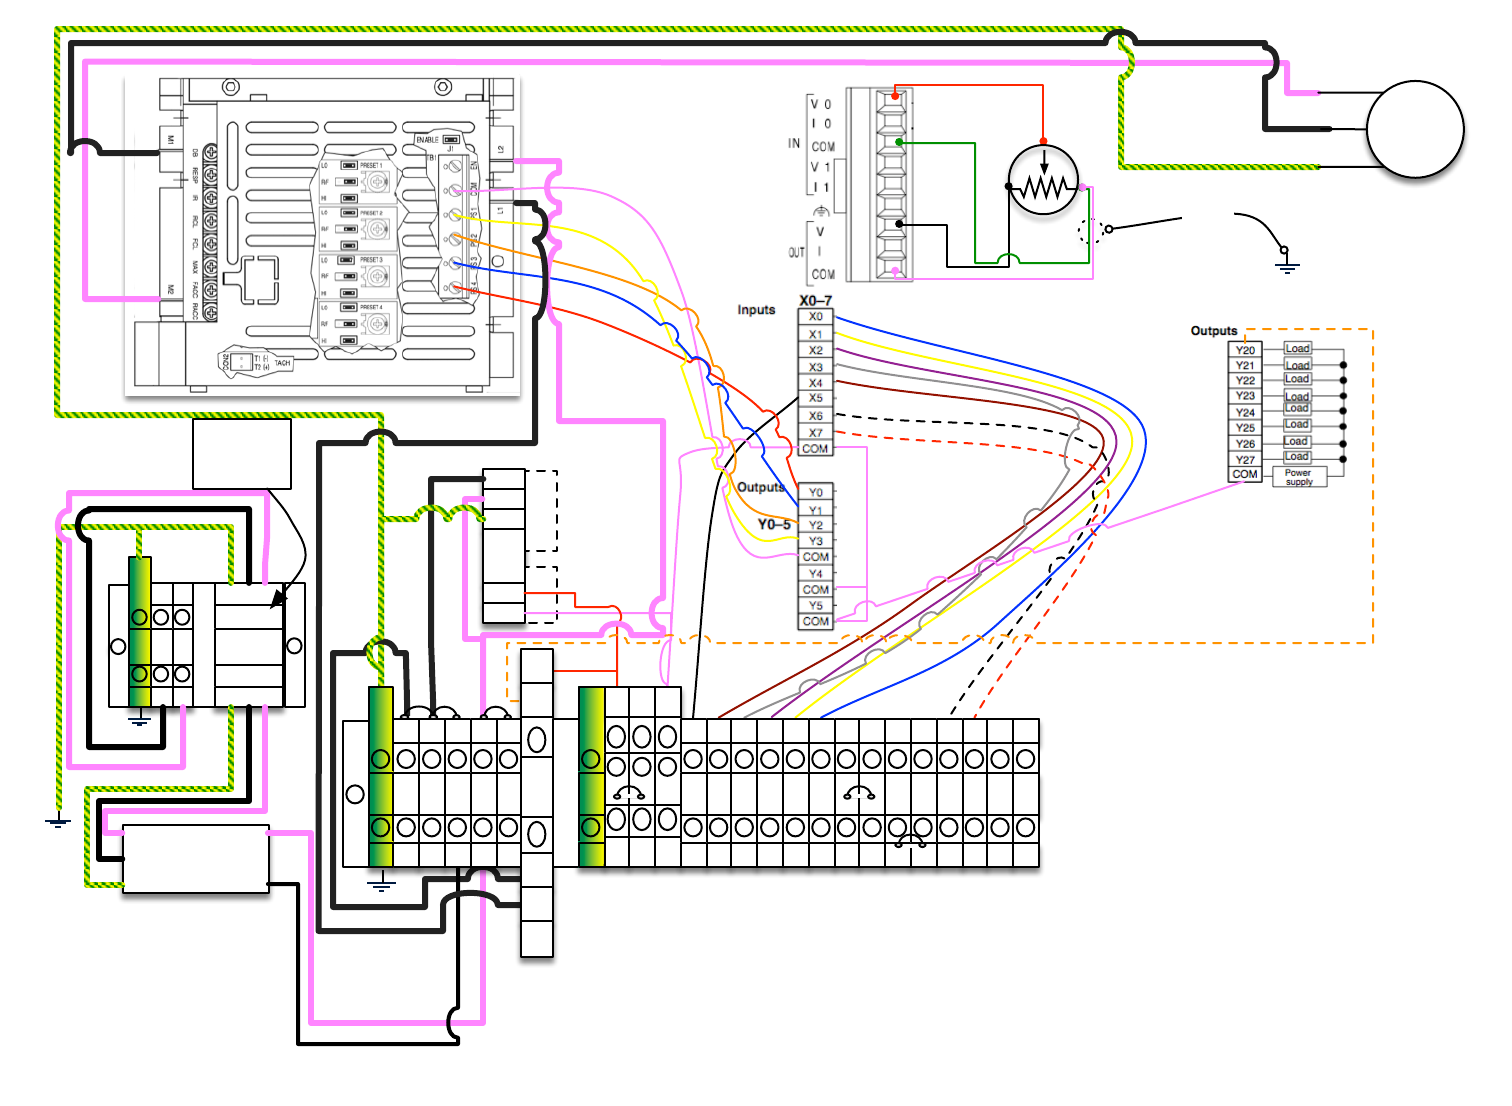 Custom Operator Wiring Diagrams DO Actuator LE_V1.2 LE V1.2 on